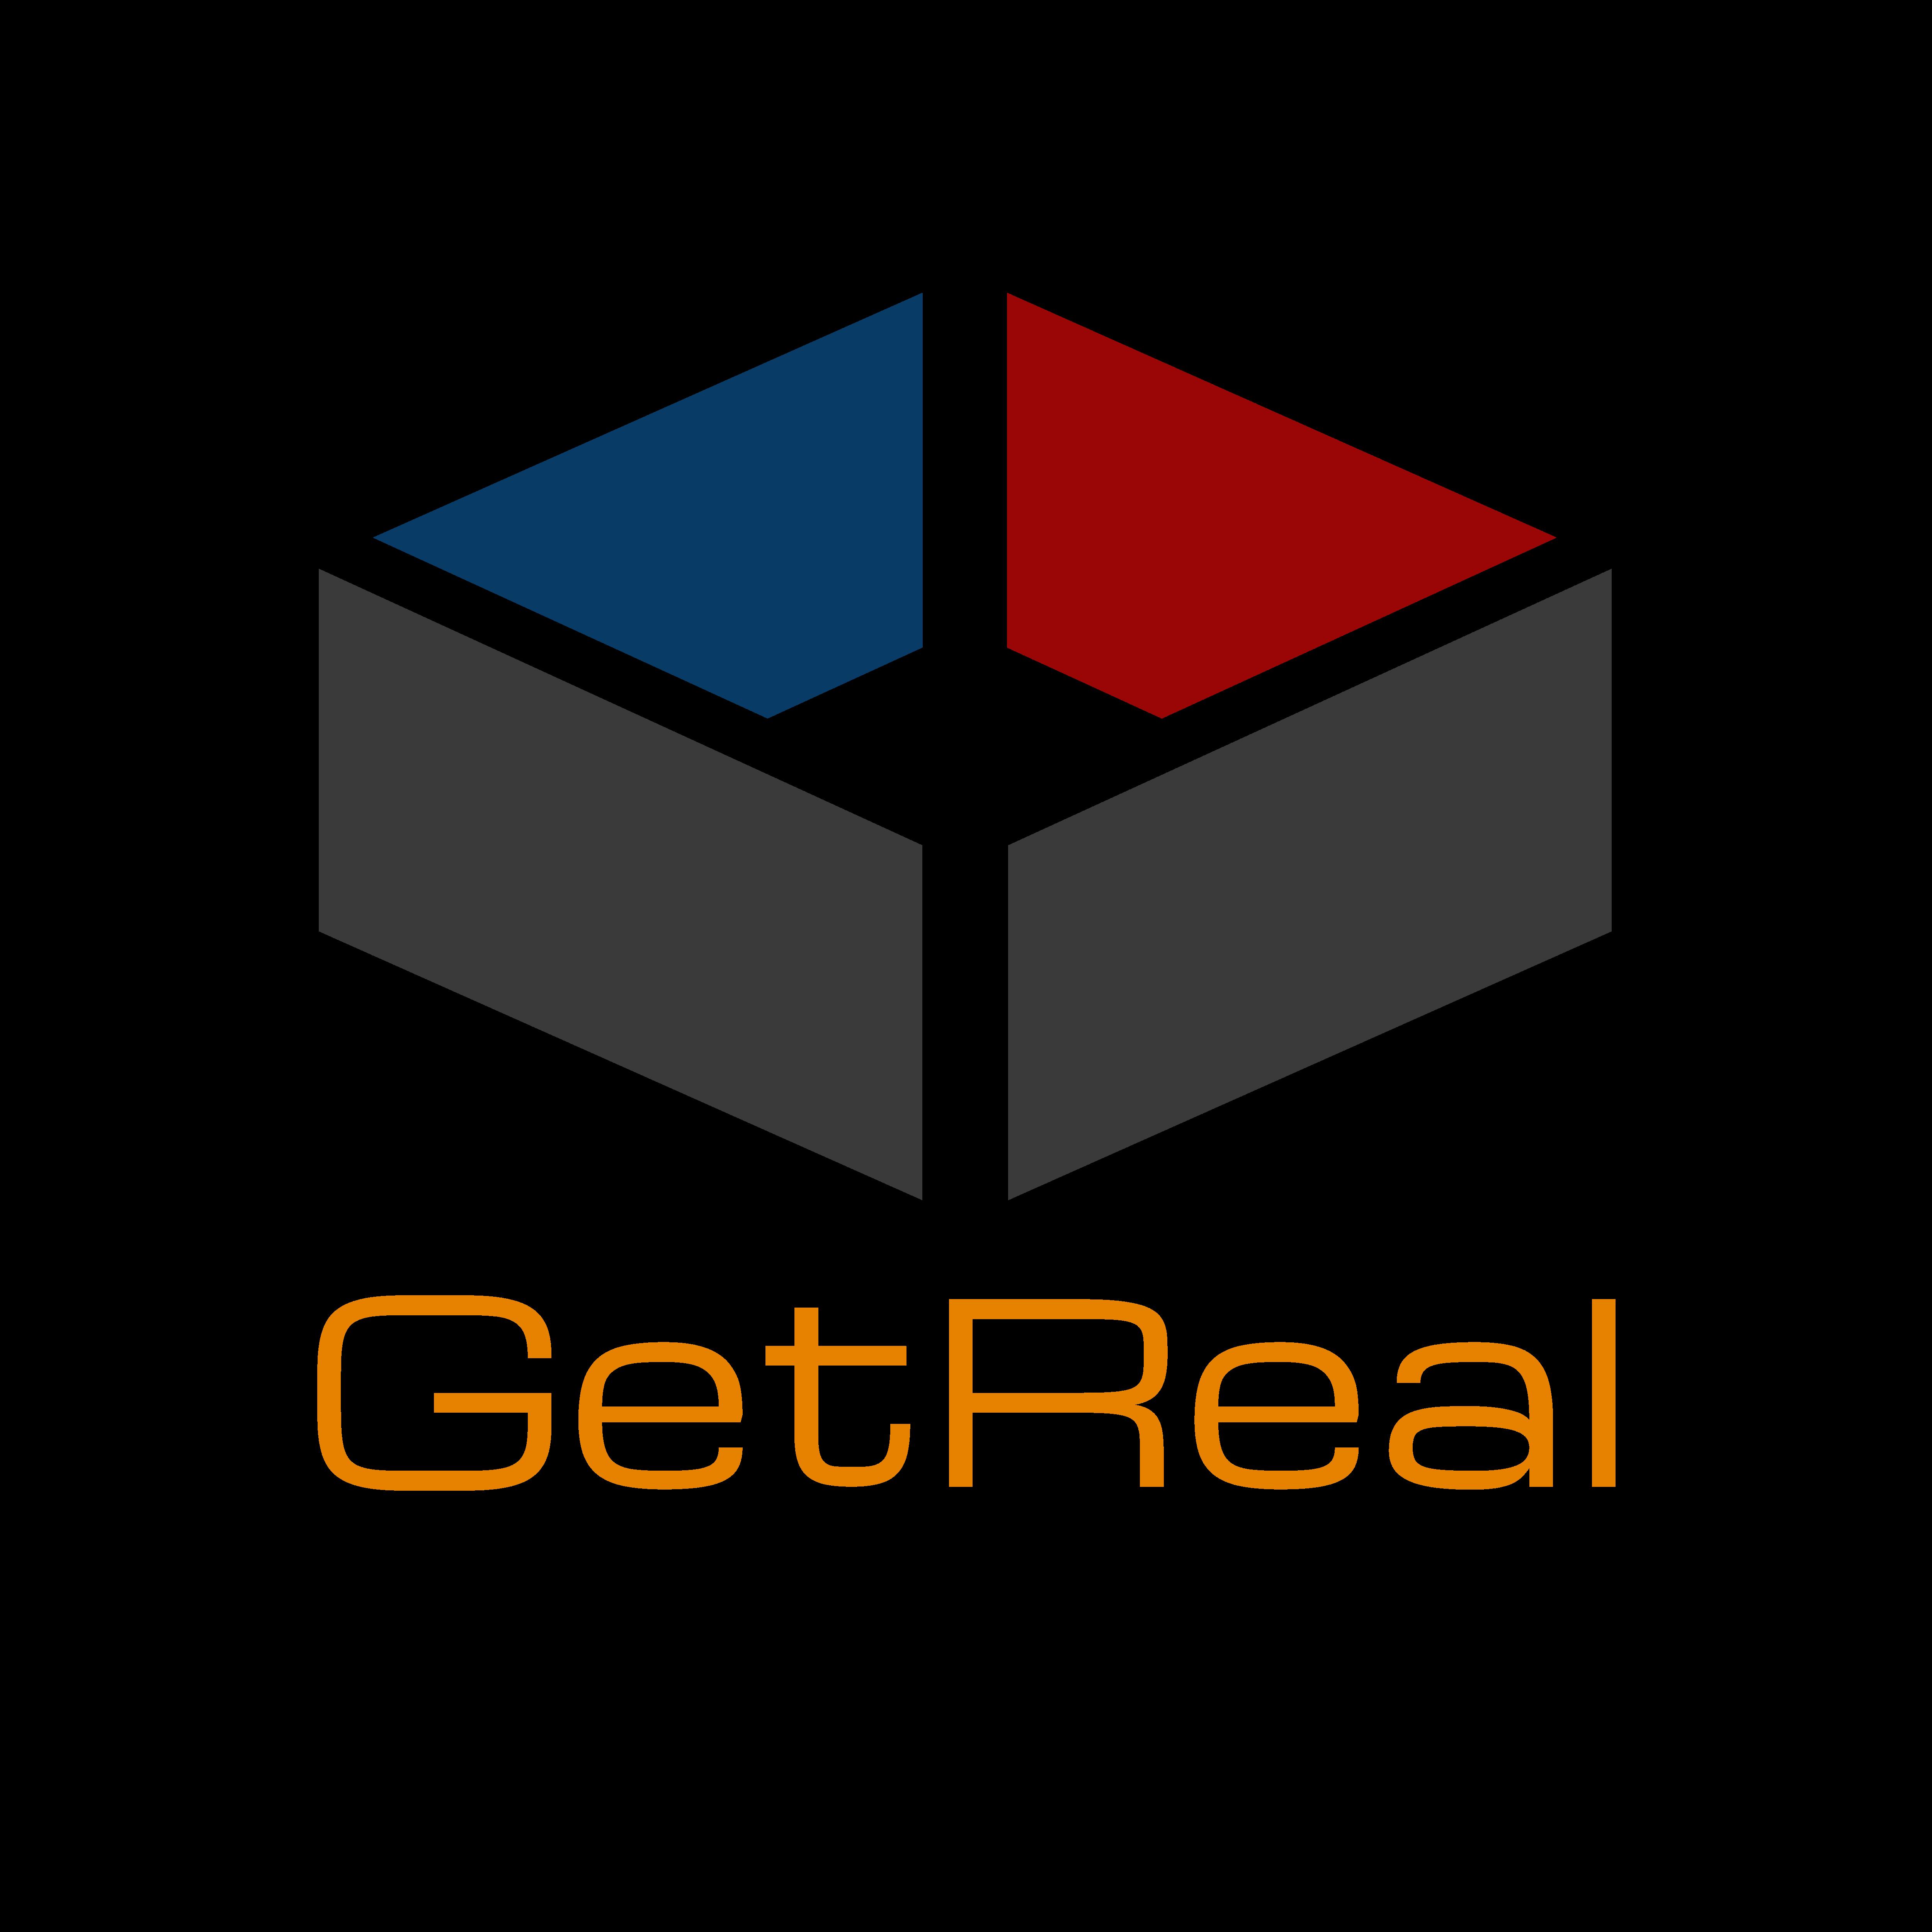 GetReal